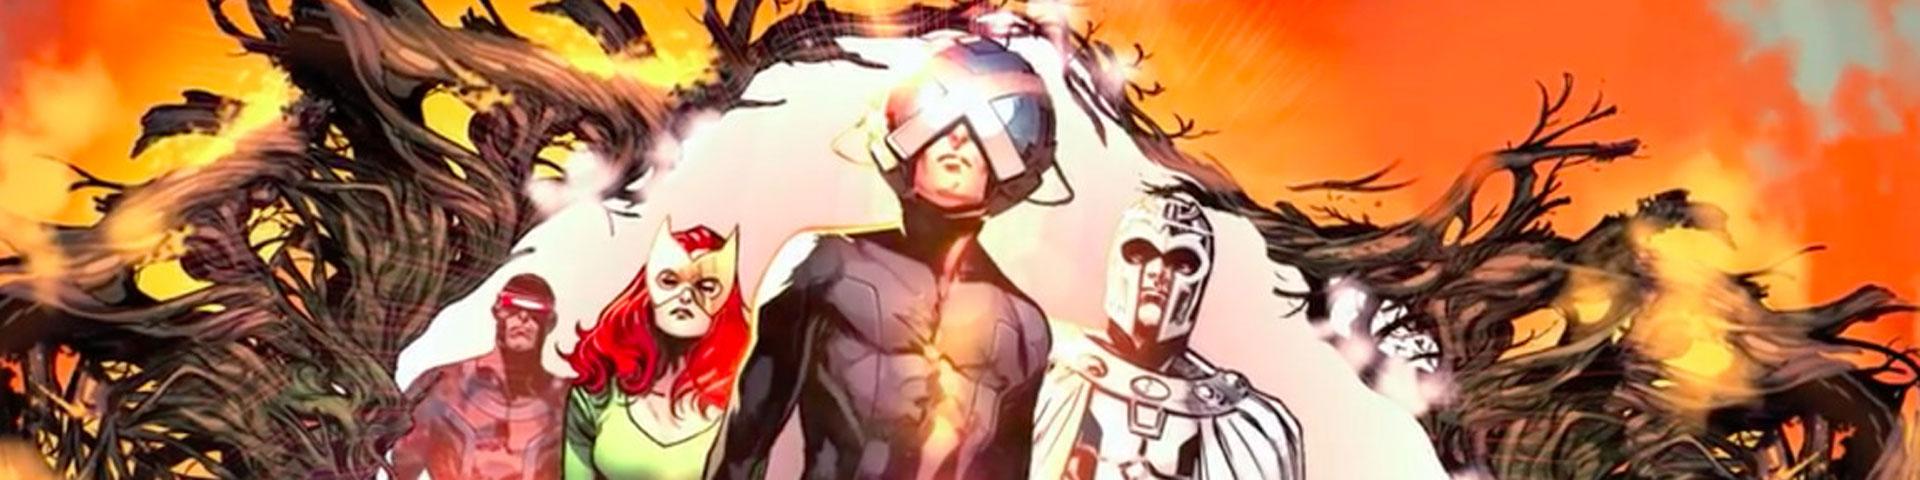 The X-men step through an otherworldly portal.